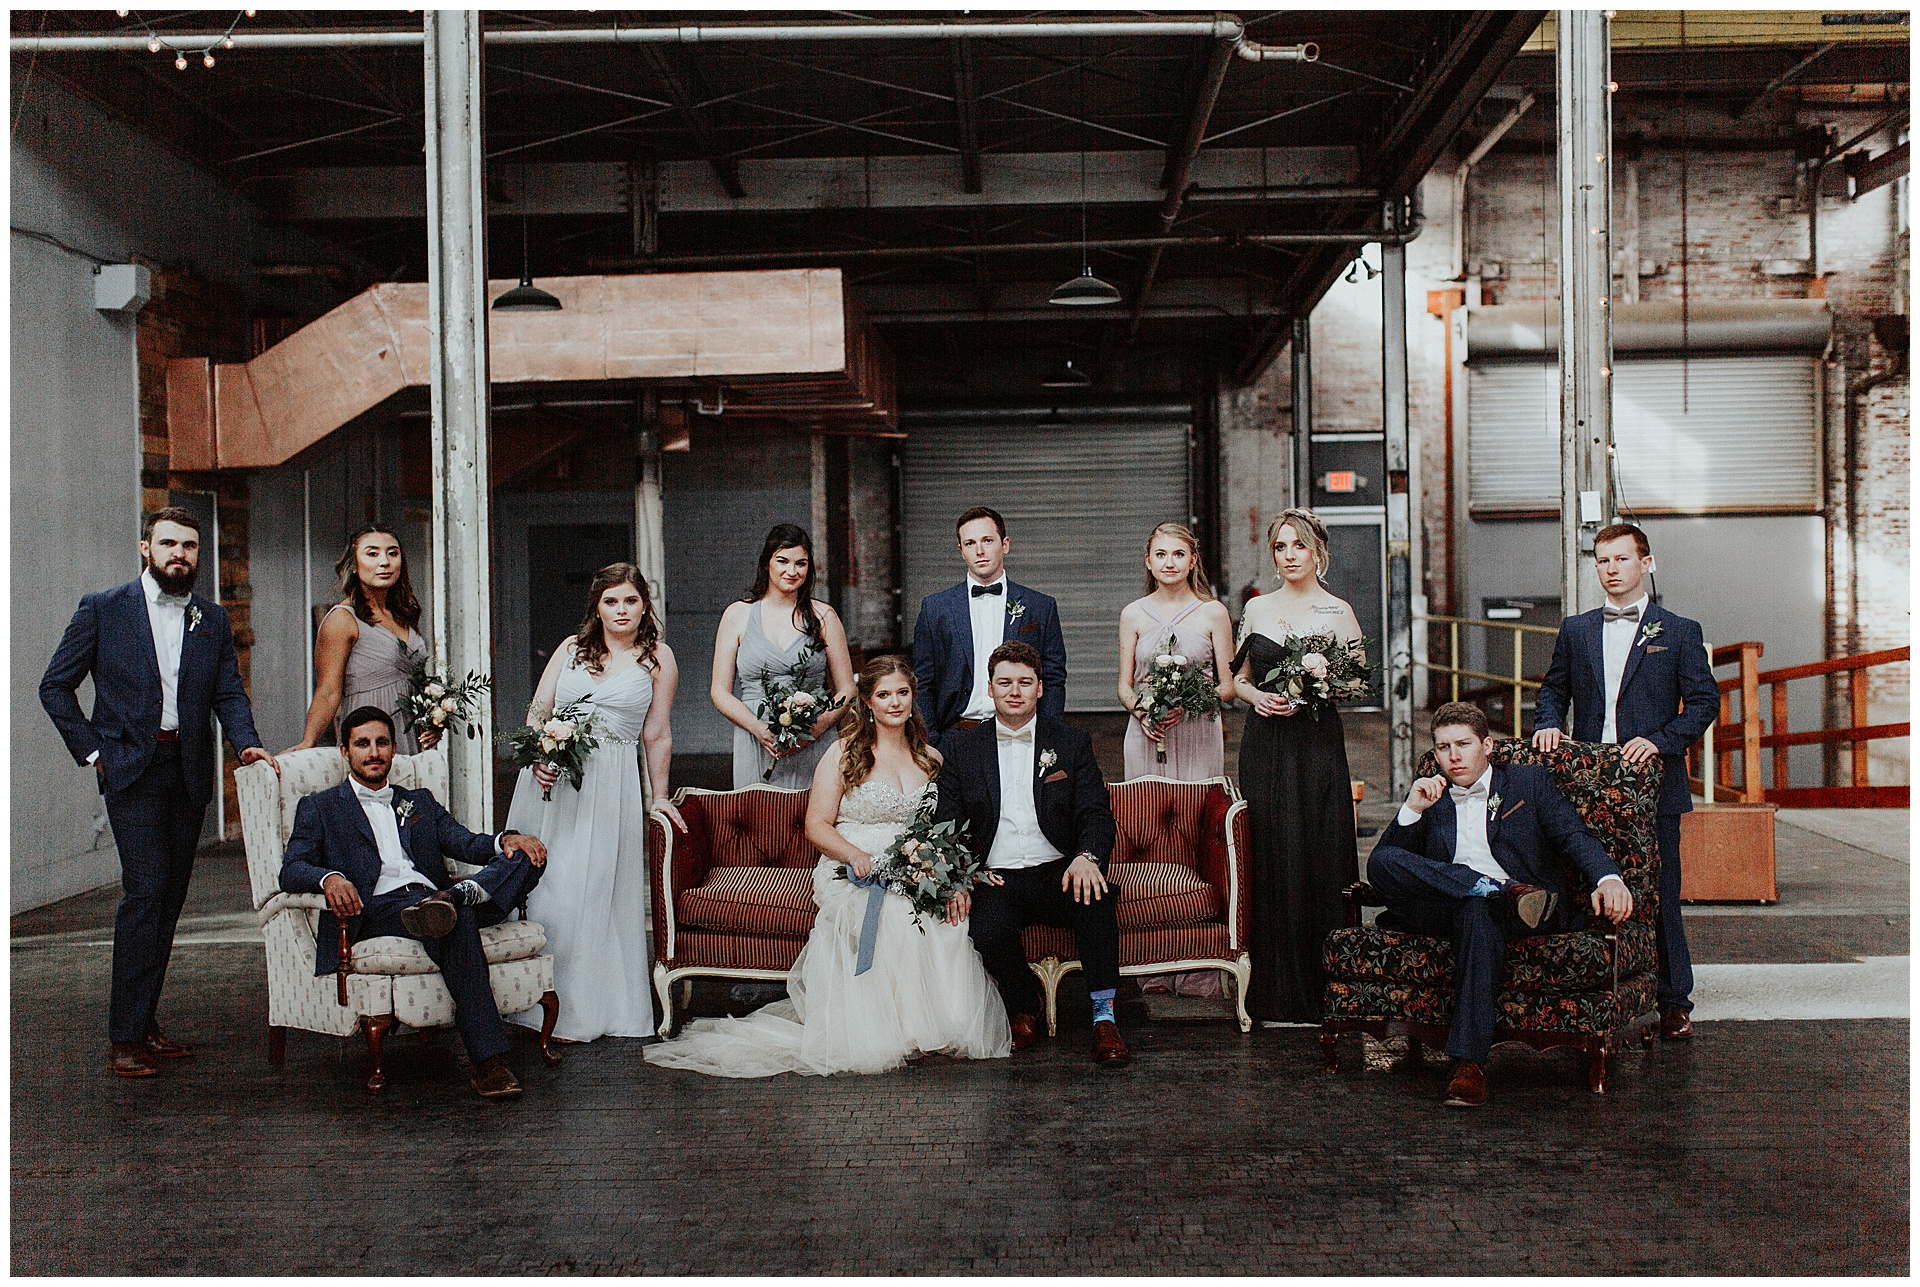 treaty oak glass factory wedding_mia dimare photography25.jpg